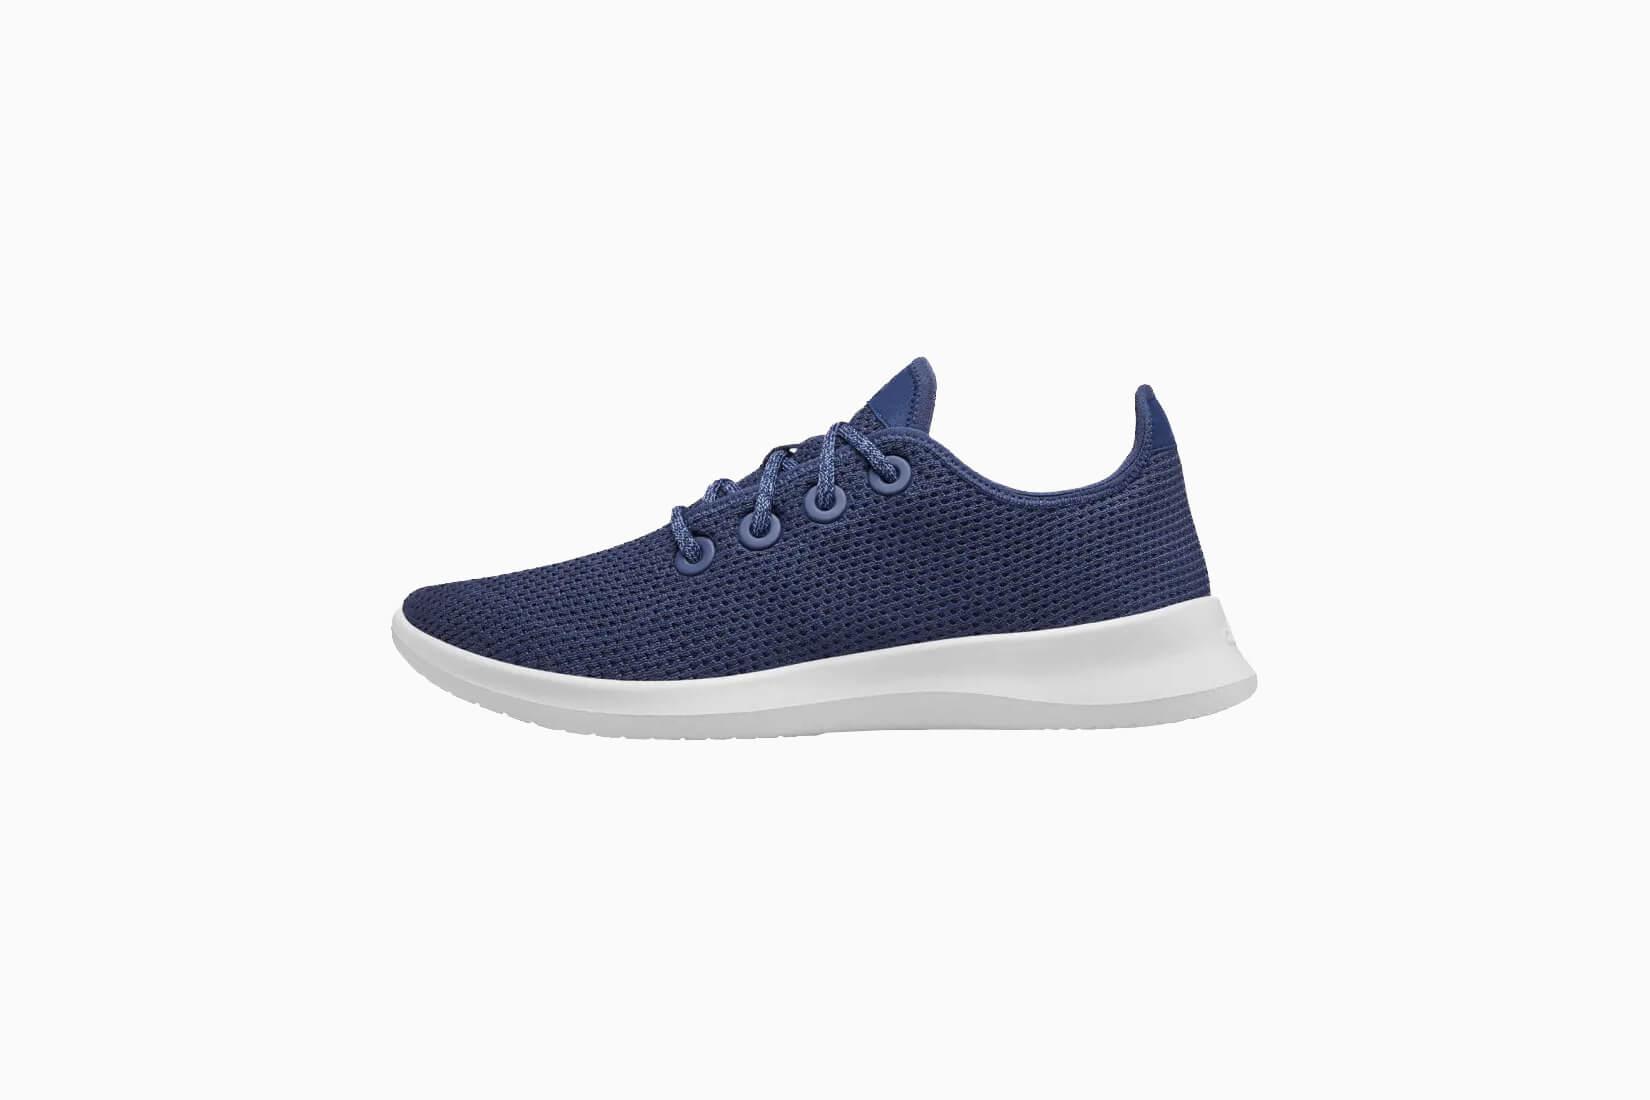 best workout shoes women allbirds review - Luxe Digital